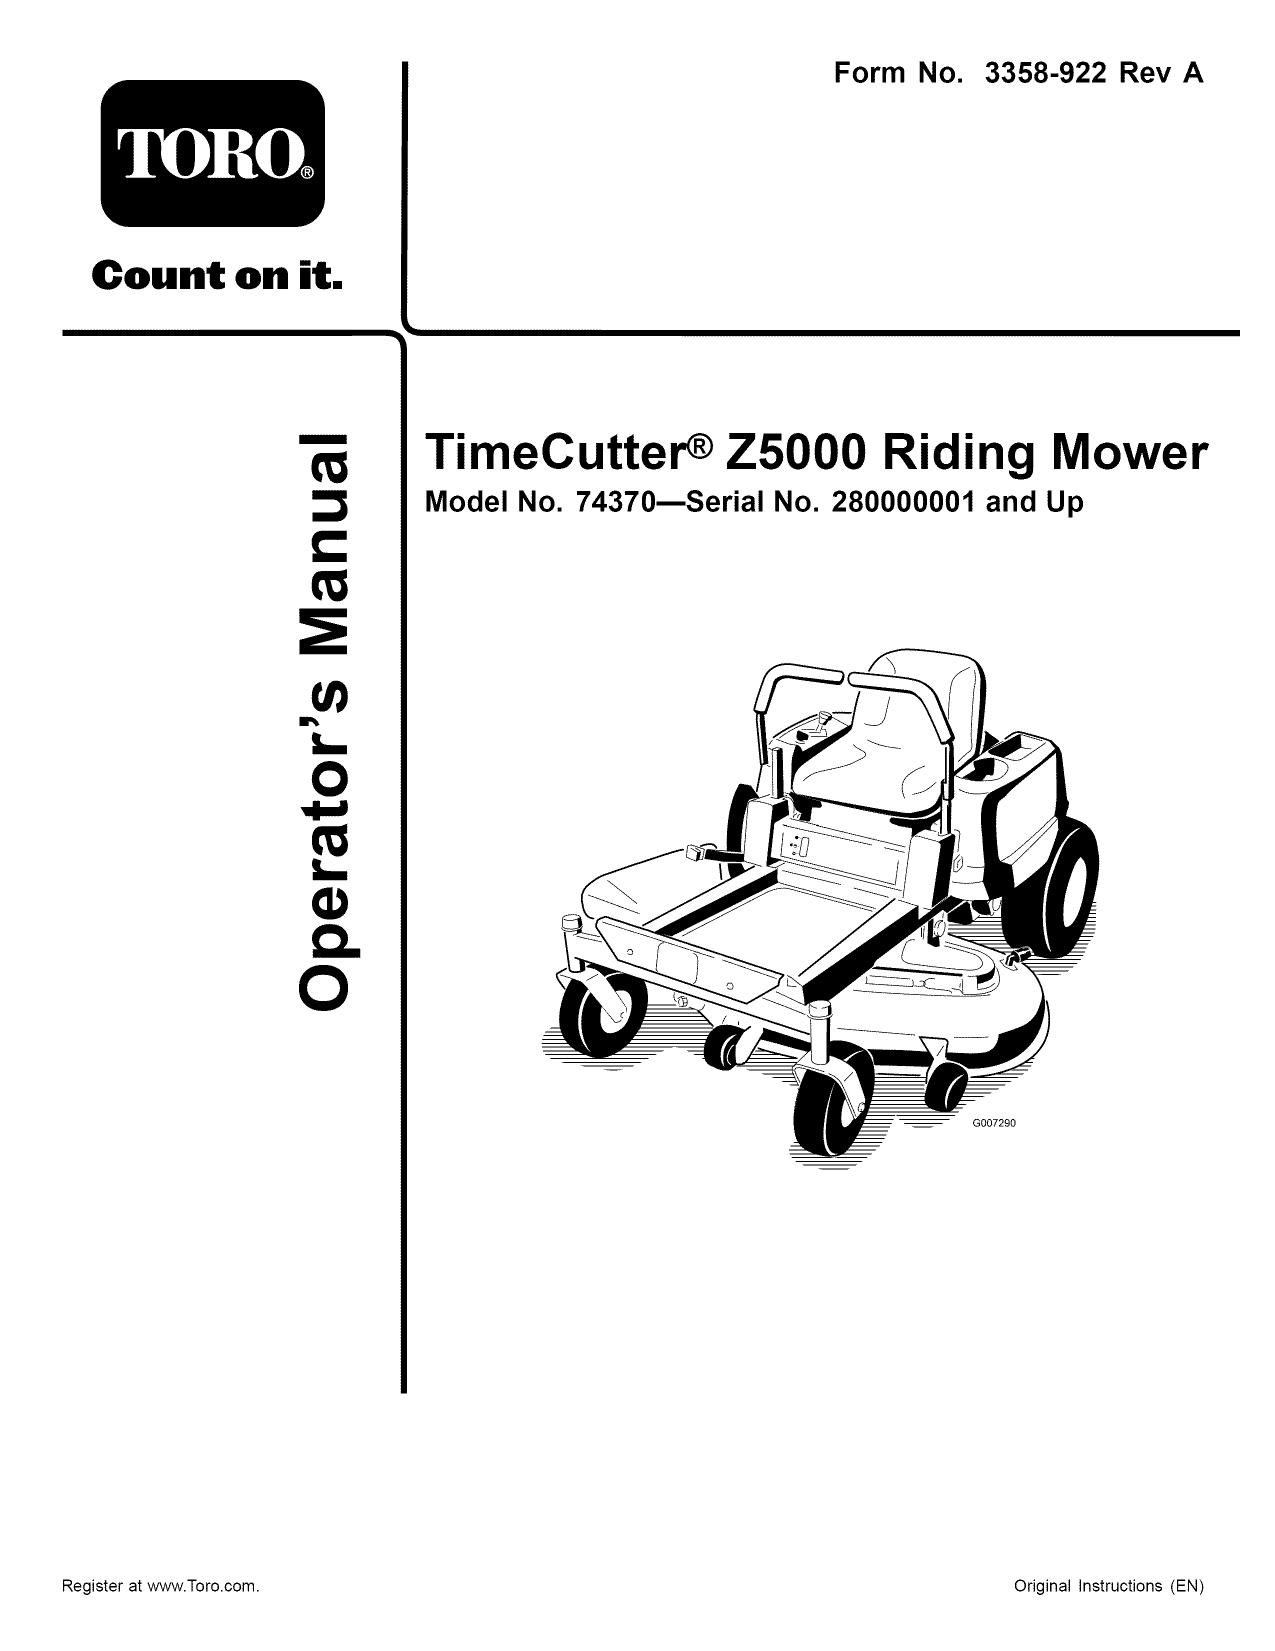 Toro 74370 (270000001-270999999) Riding Lawn Mower Owner's